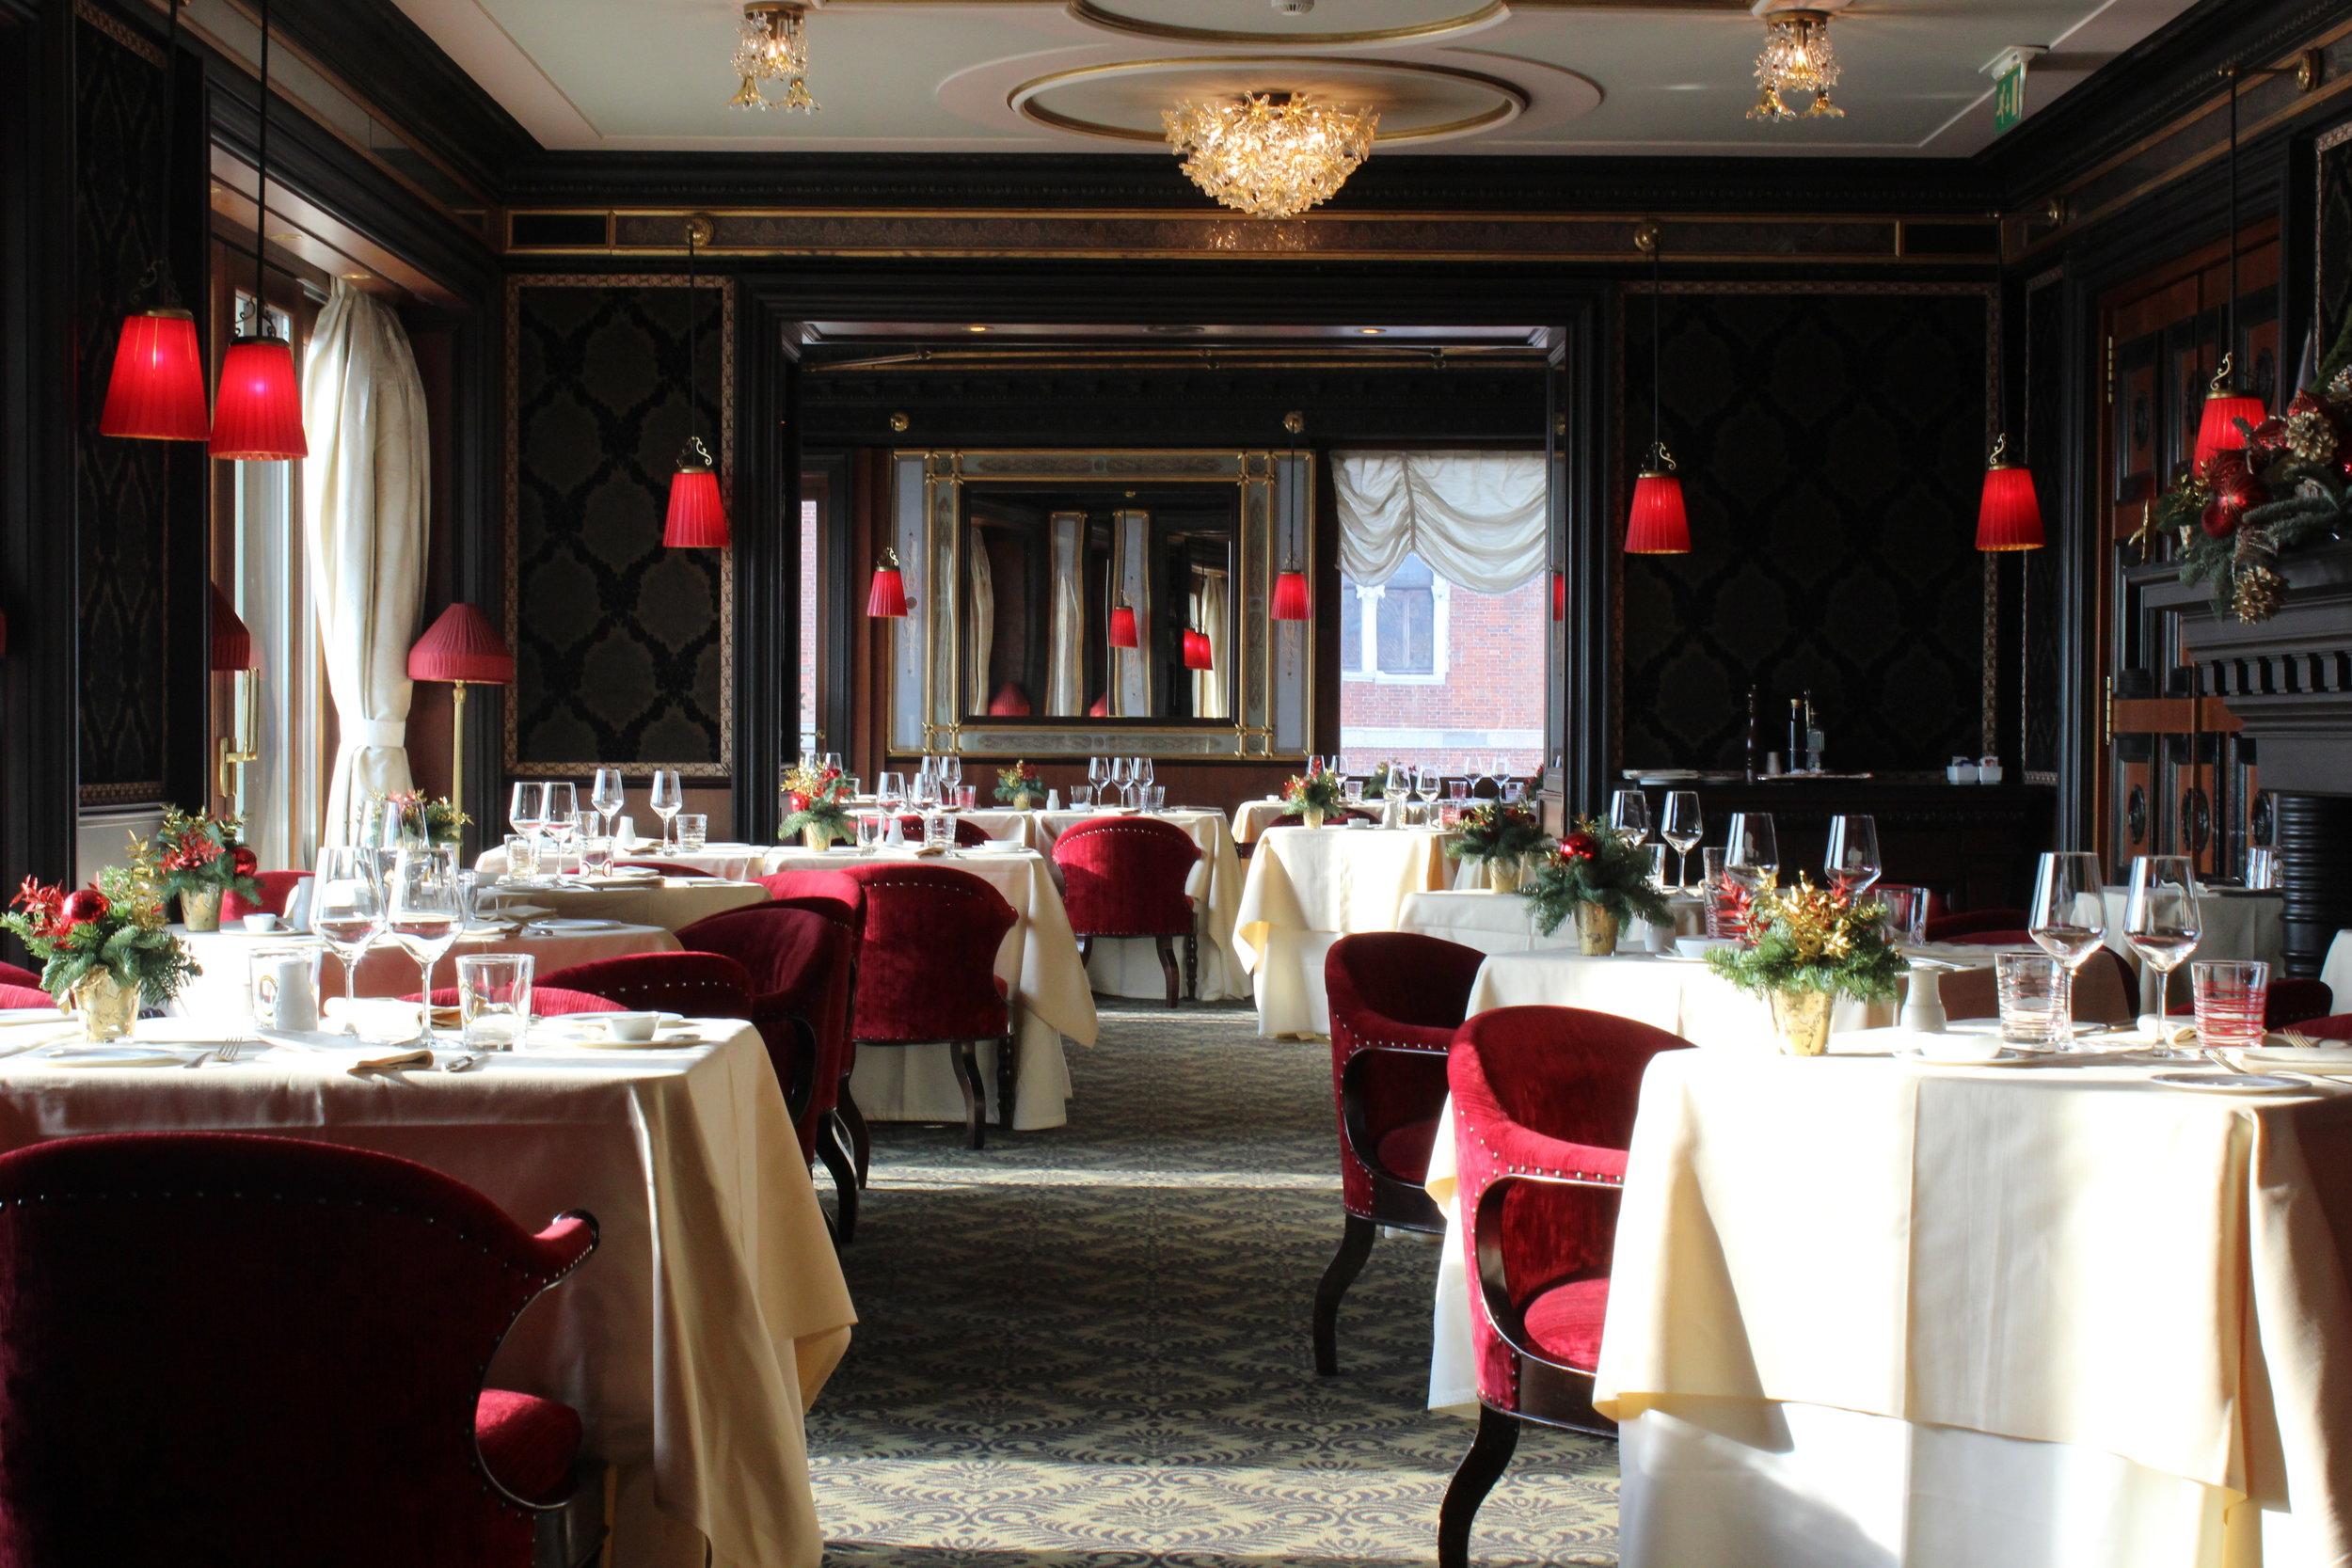 Venice Hotel Danieli Grethershot Morgan Stone Grether